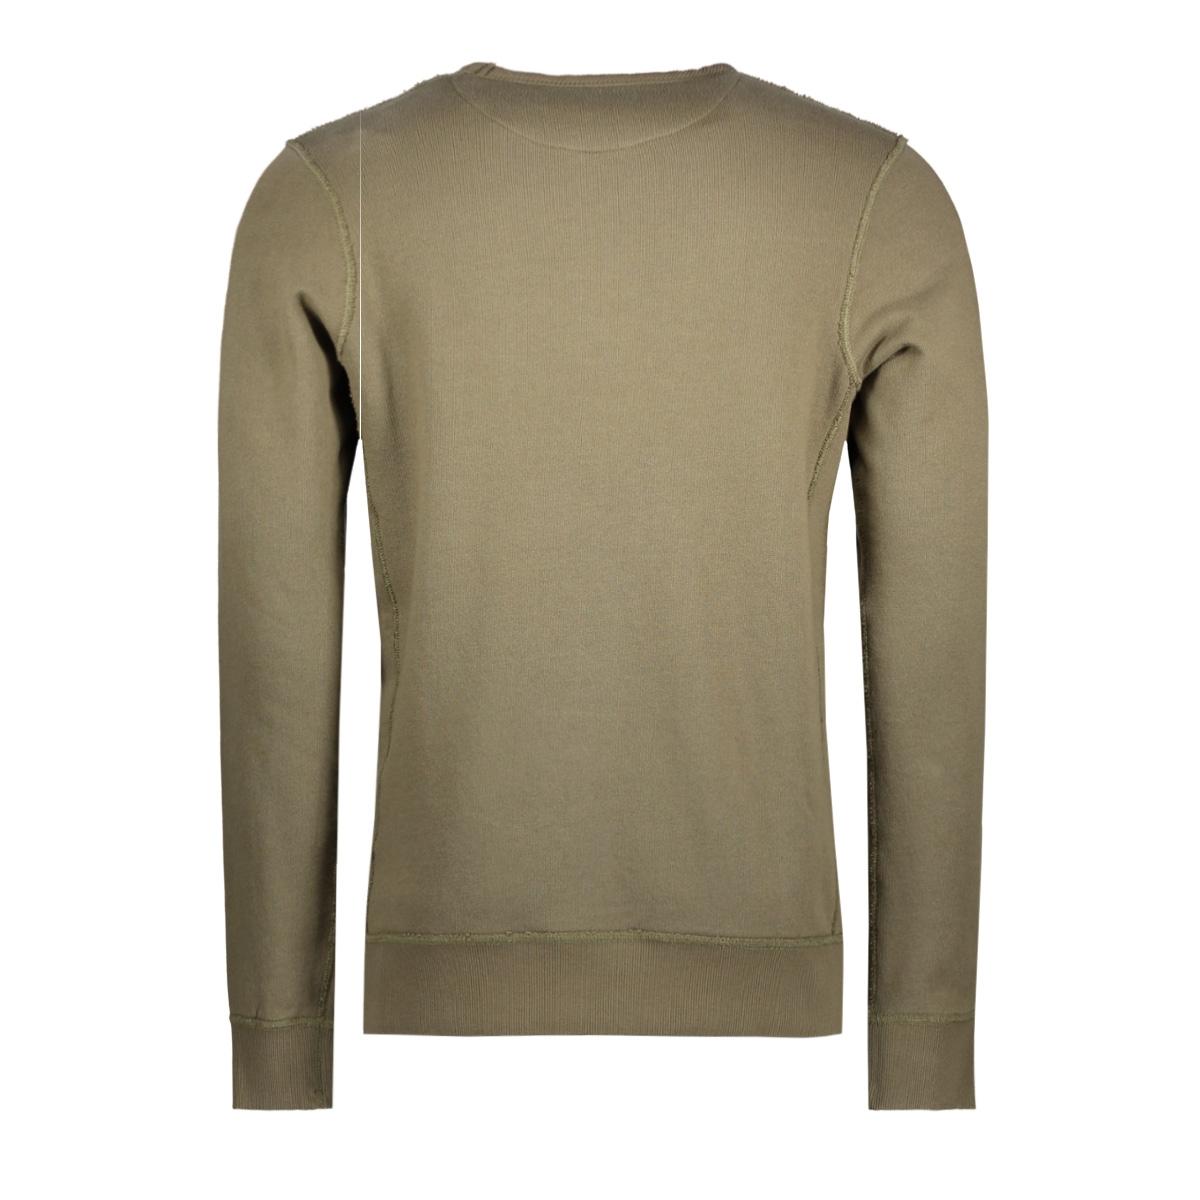 jpr37johnson sweat crew neck 12136871 jack & jones sweater sea turtle